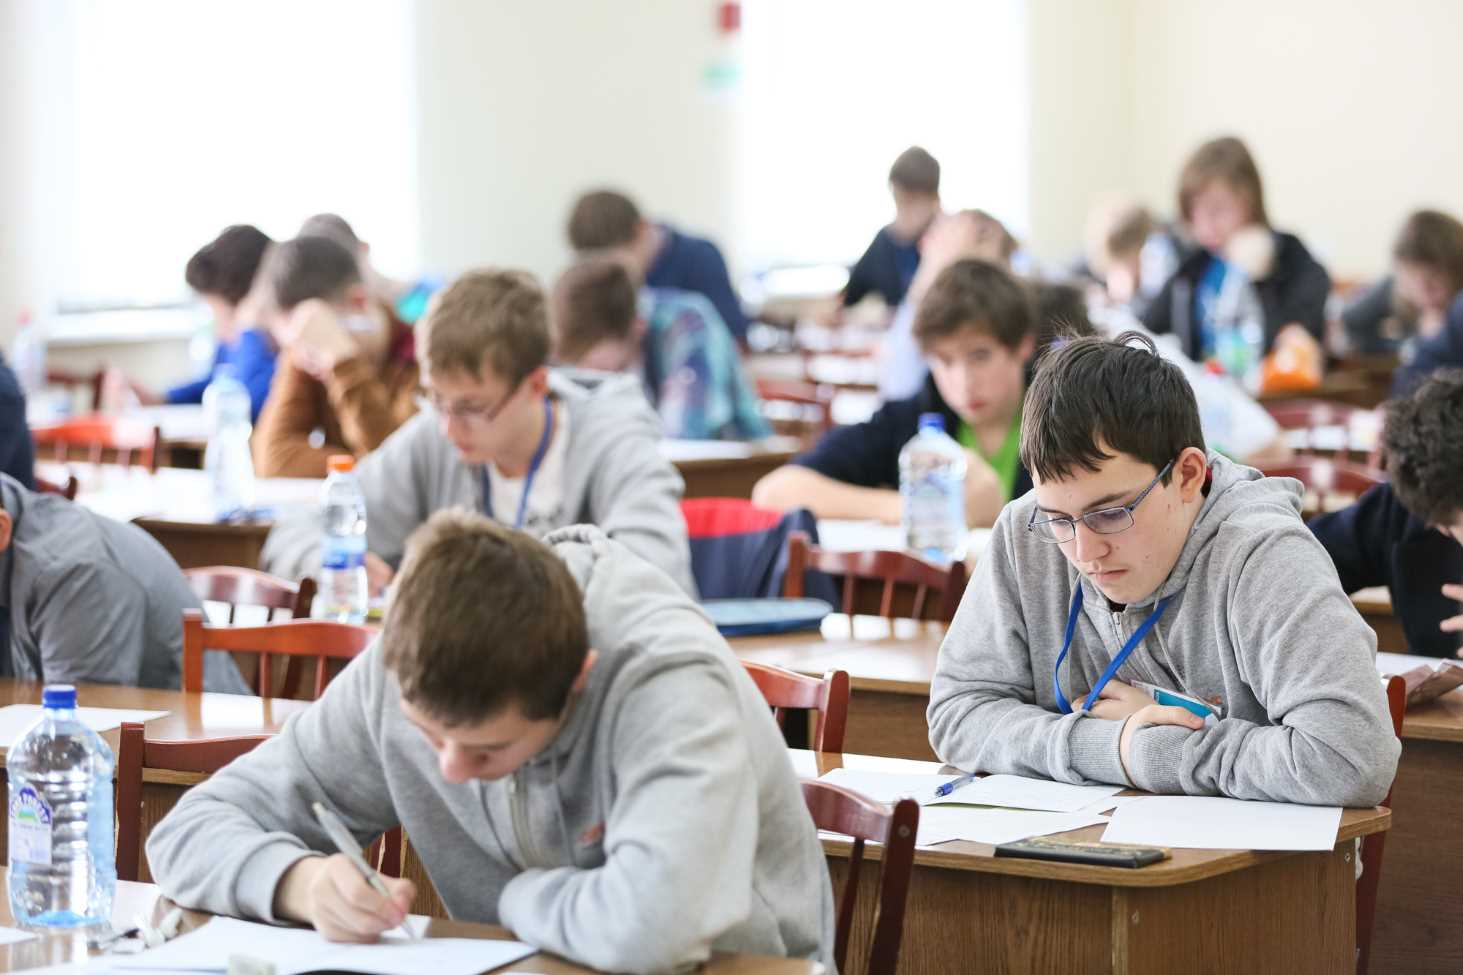 moskovskie-shkolniki-pobili-rekord-vserossijskoj-olimpiady-po-chislu-diplomov